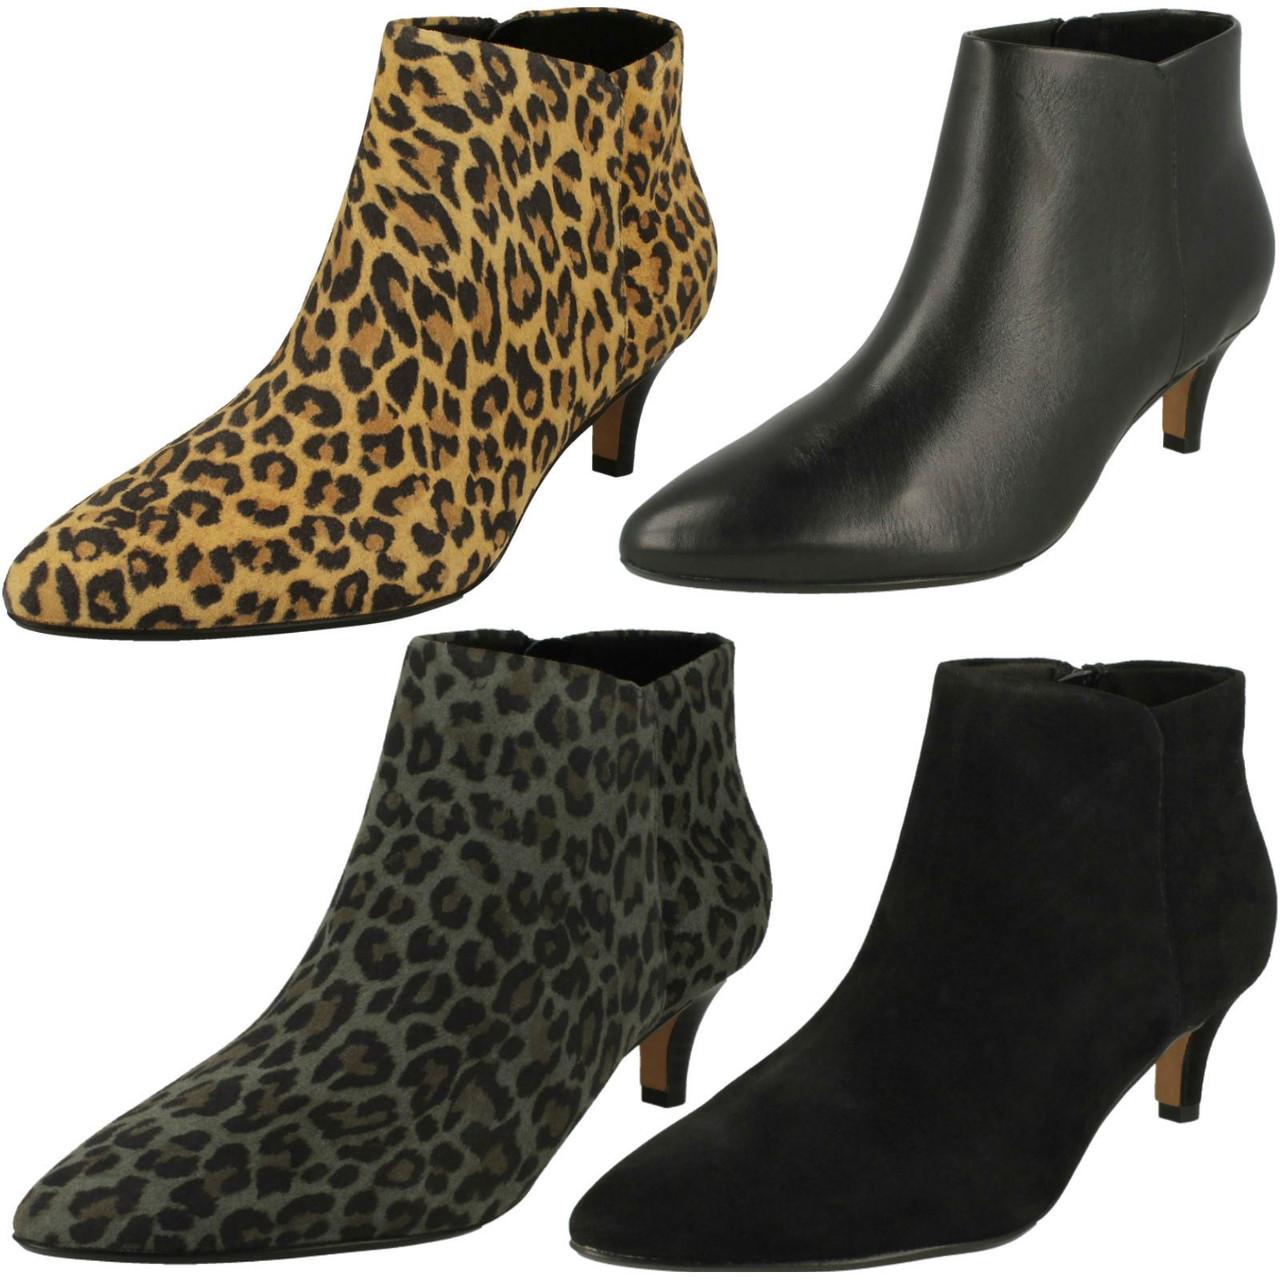 Ladies Clarks Kitten Heel Ankle Boots